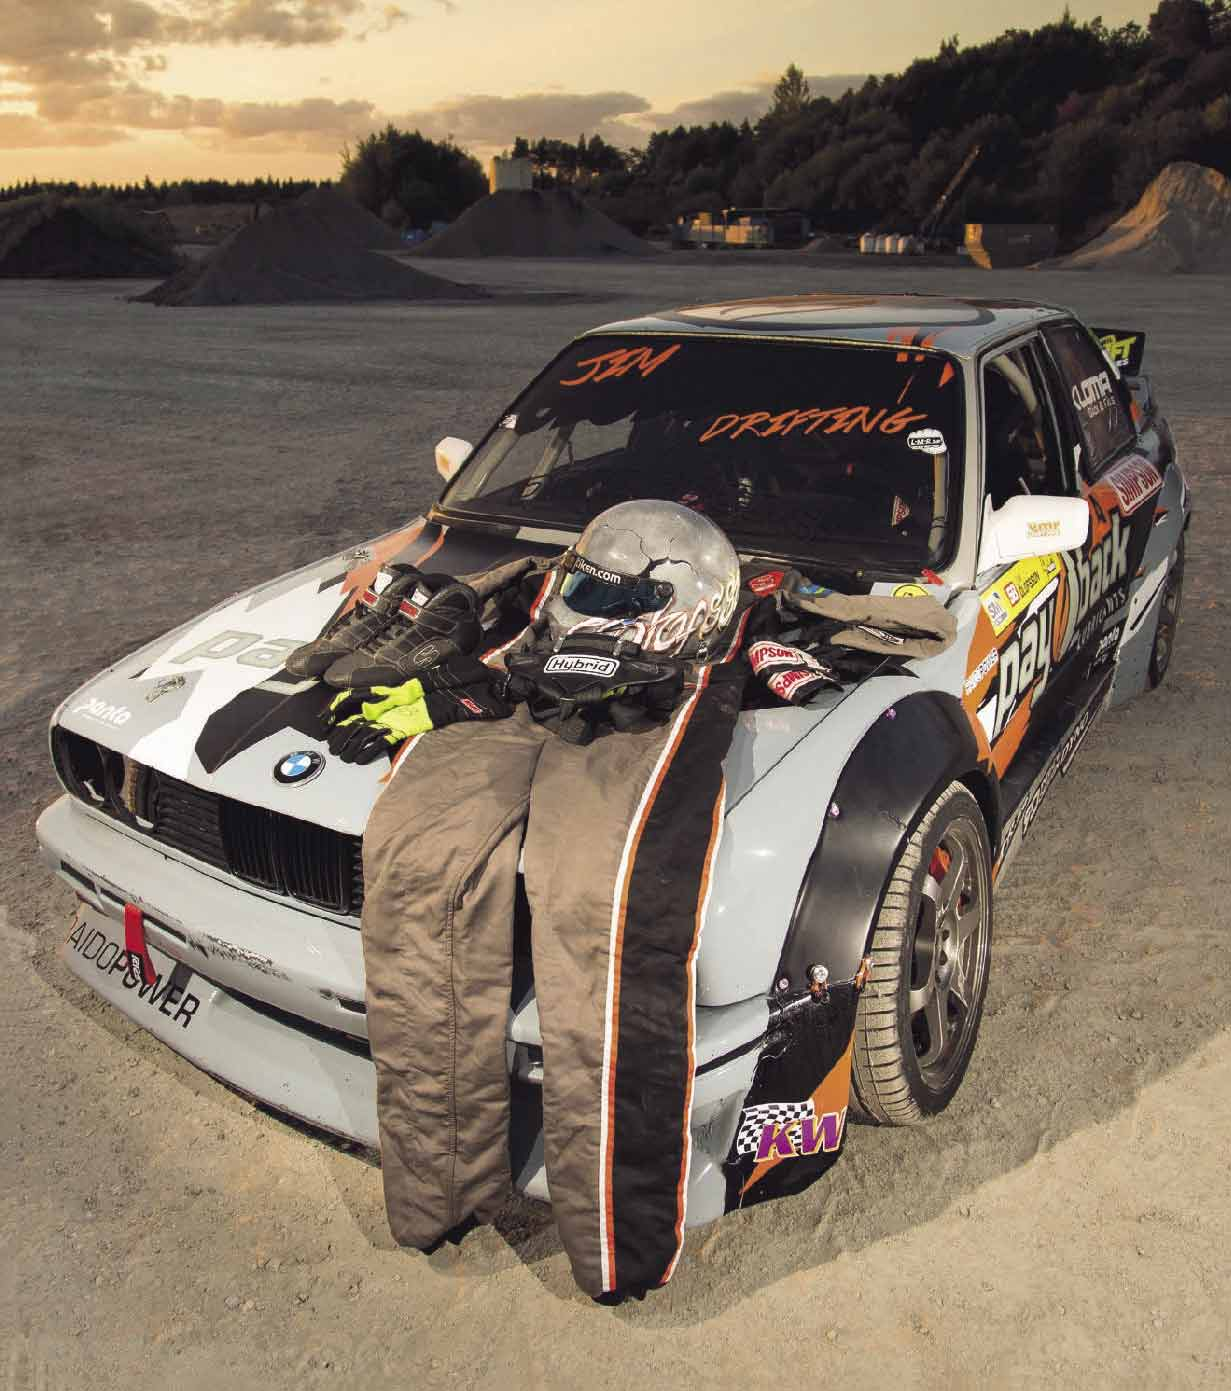 940whp M50B25 turbo drift BMW E30 Coupe - Drive-My Blogs - Drive